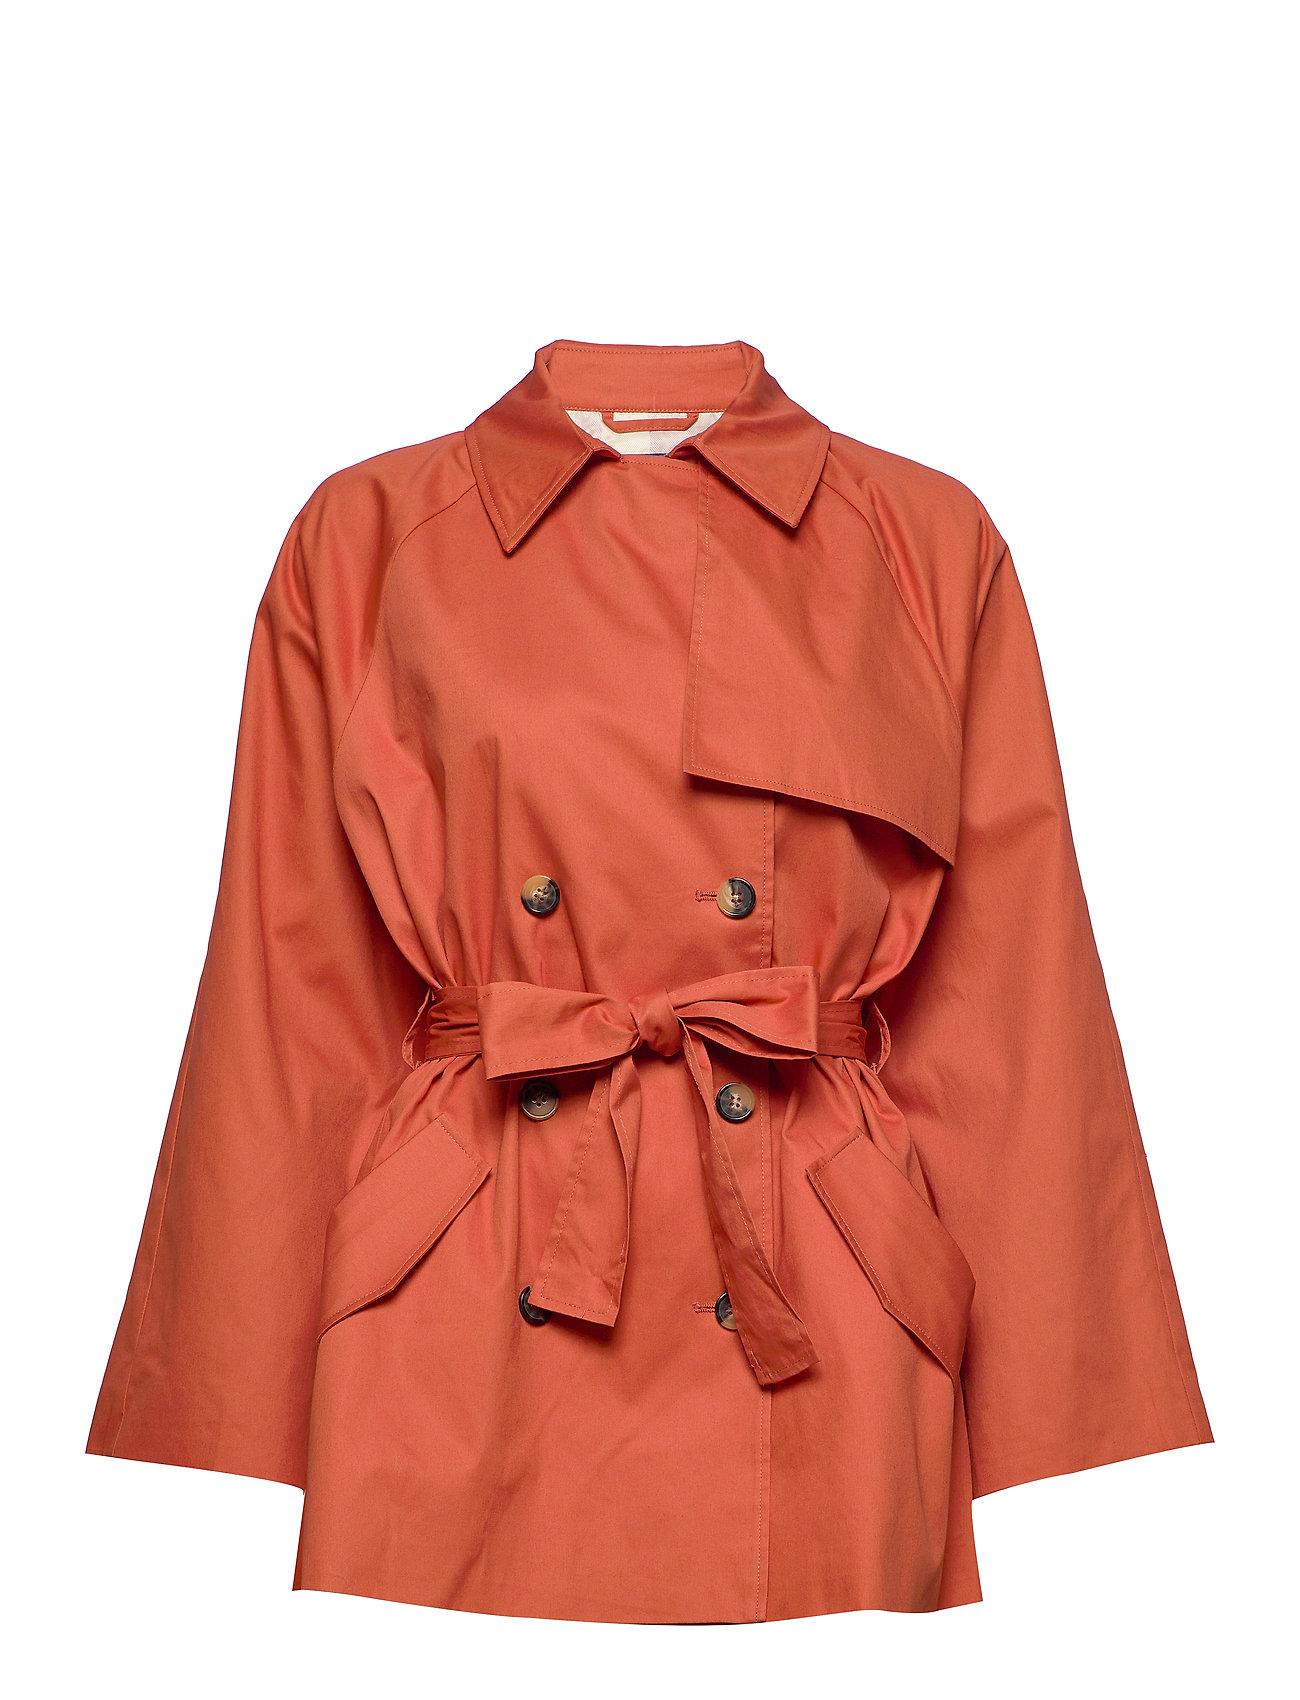 Image of Slchicago Short Trenchcoat Trenchcoat Frakke Orange Soaked In Luxury (3350043757)